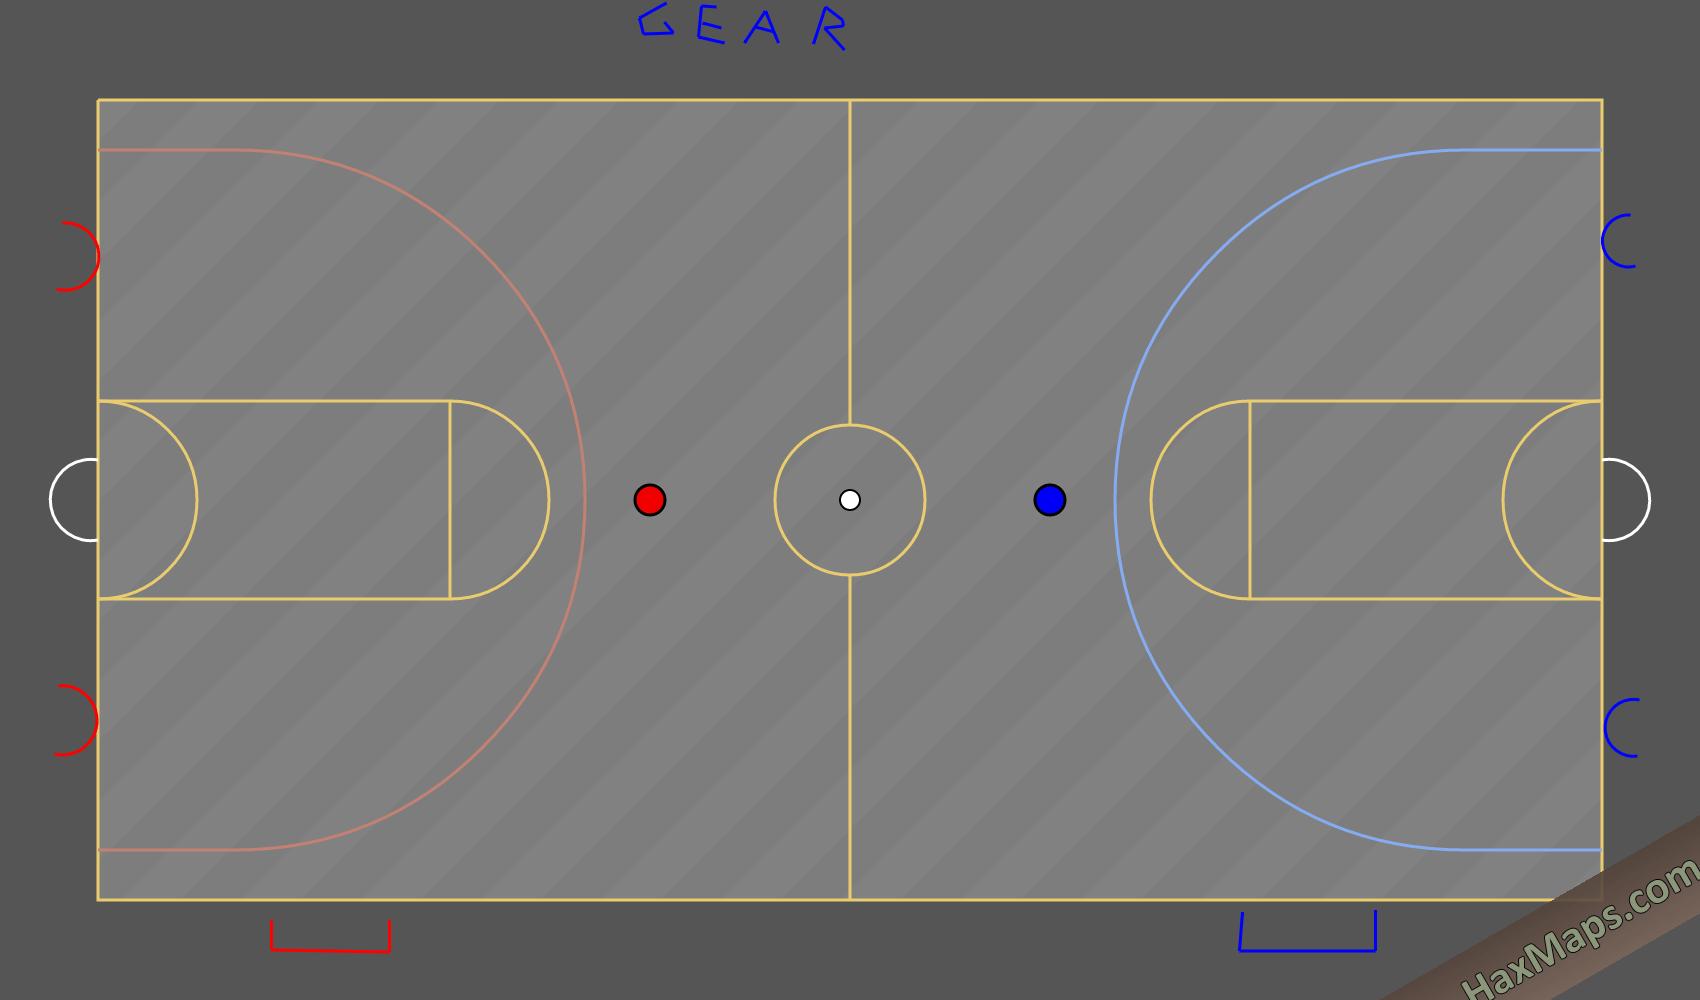 hax ball maps | Gear Basketball REAL 2 Fixed